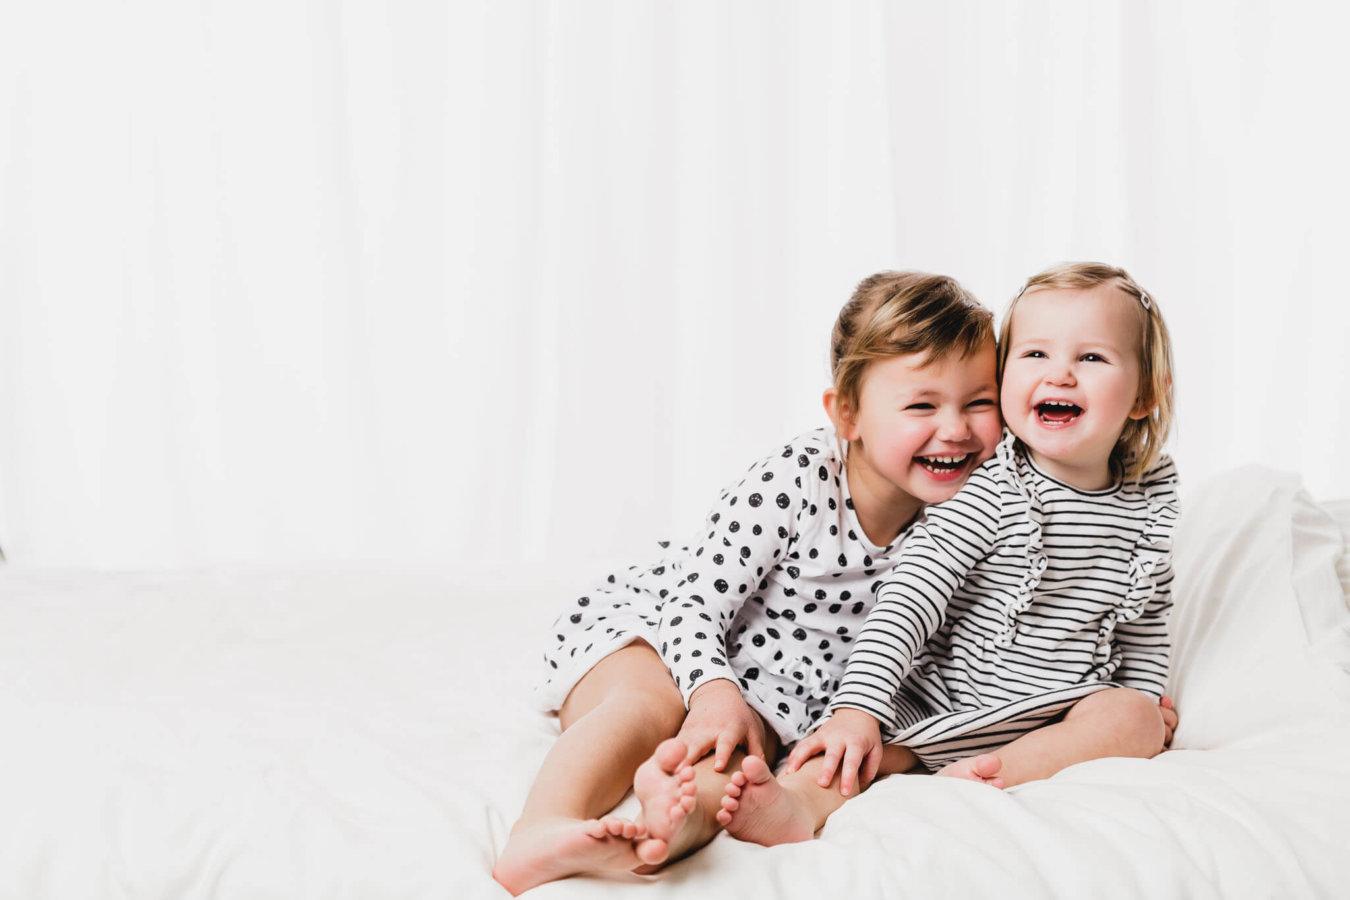 Kinder Fotoshooting Schwestern